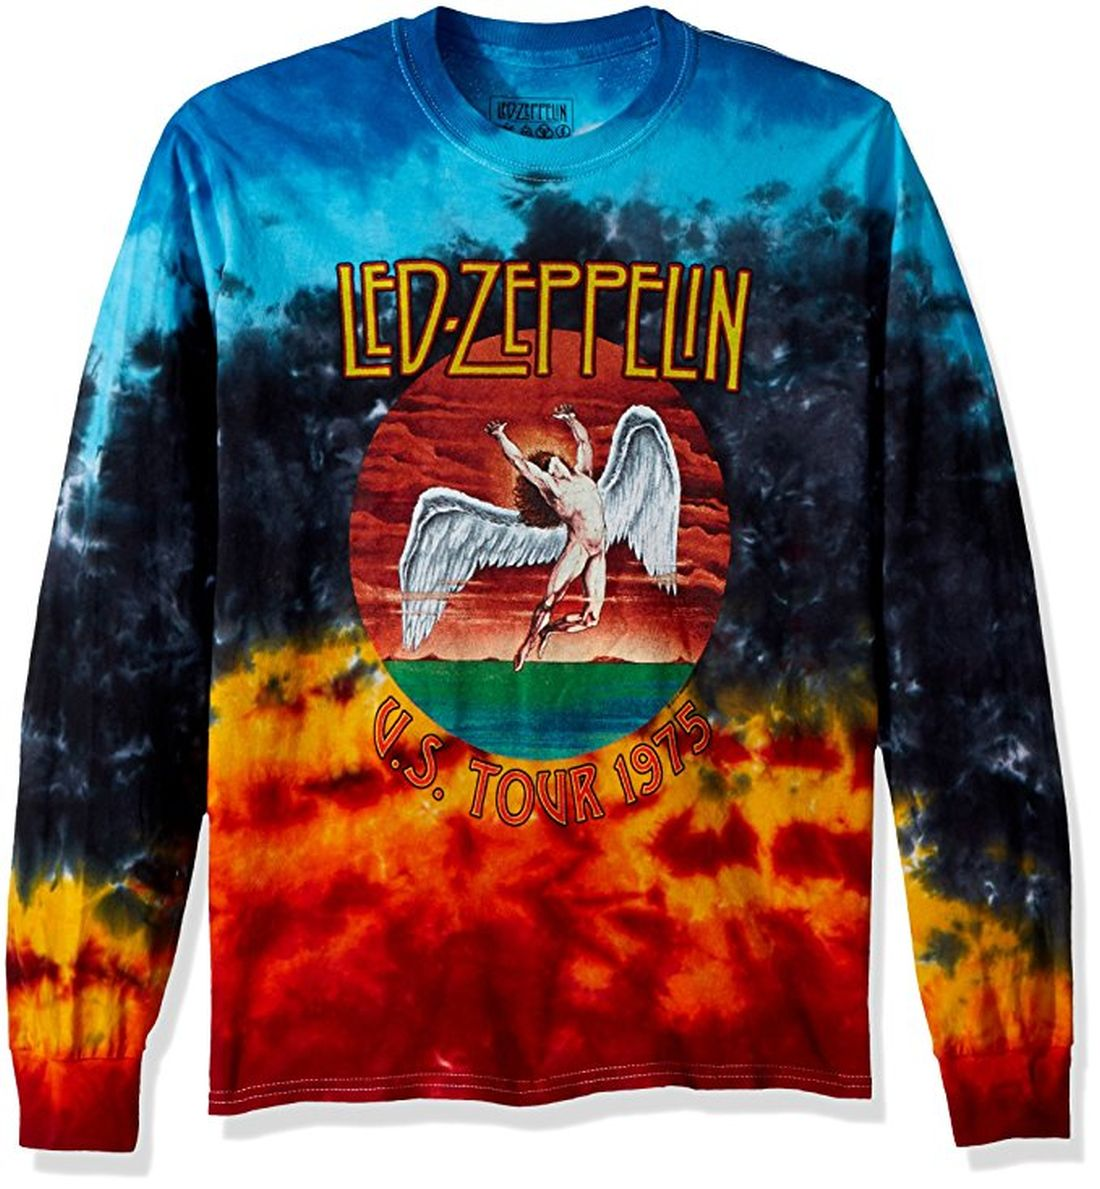 e1ae0bbf2 Led Zeppelin Icarus 1975 Long Sleeve Tie-Dye T-Shirt